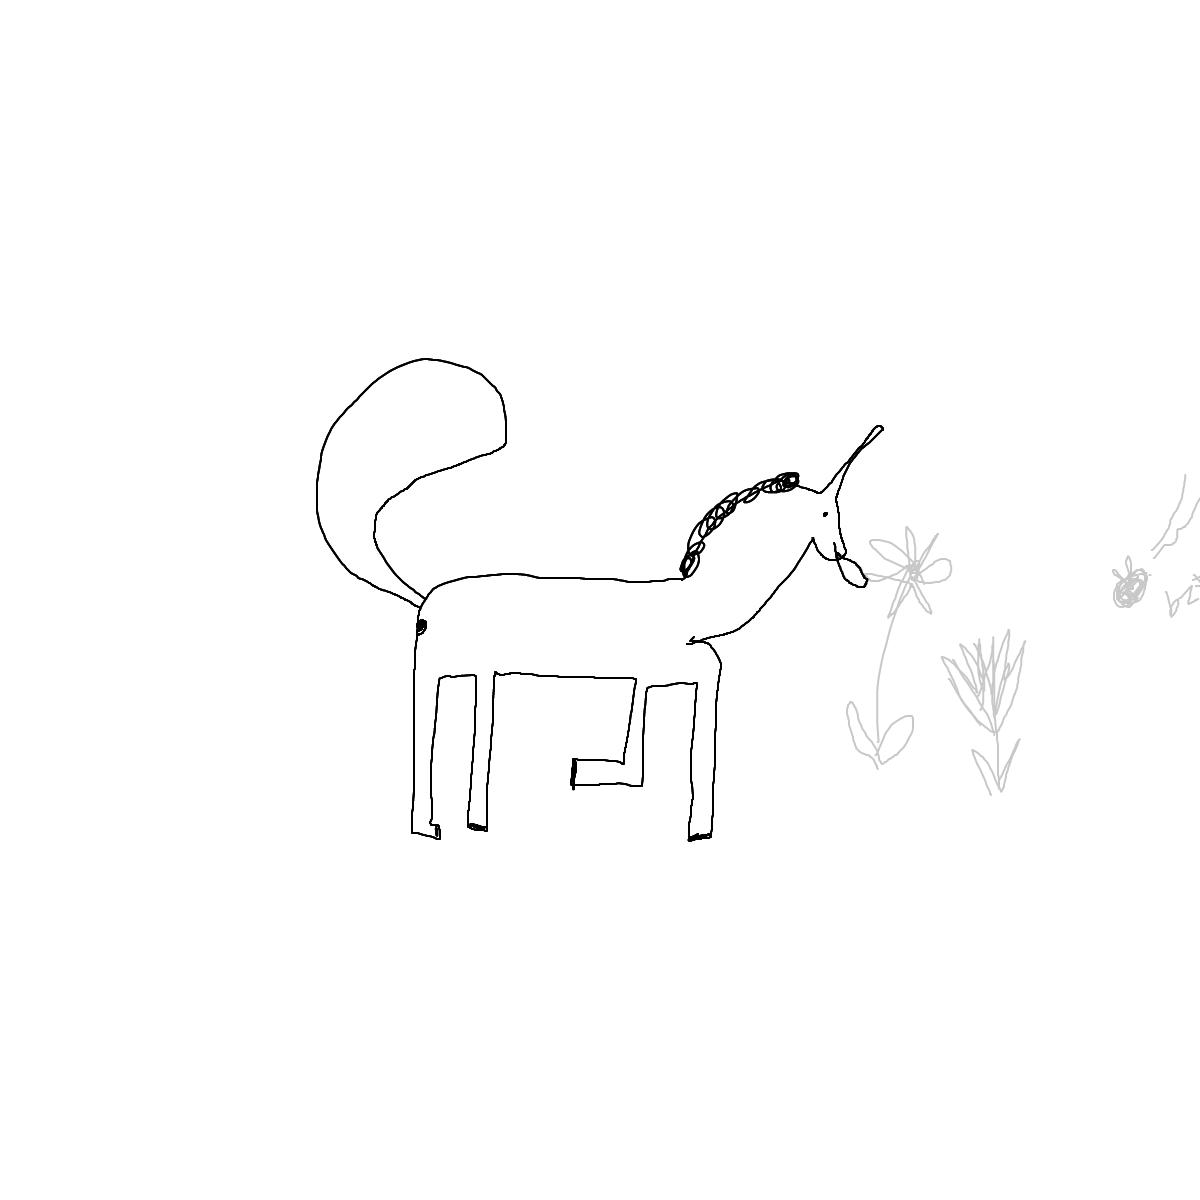 BAAAM drawing#9672 lat:52.4750747680664060lng: 13.4072036743164060